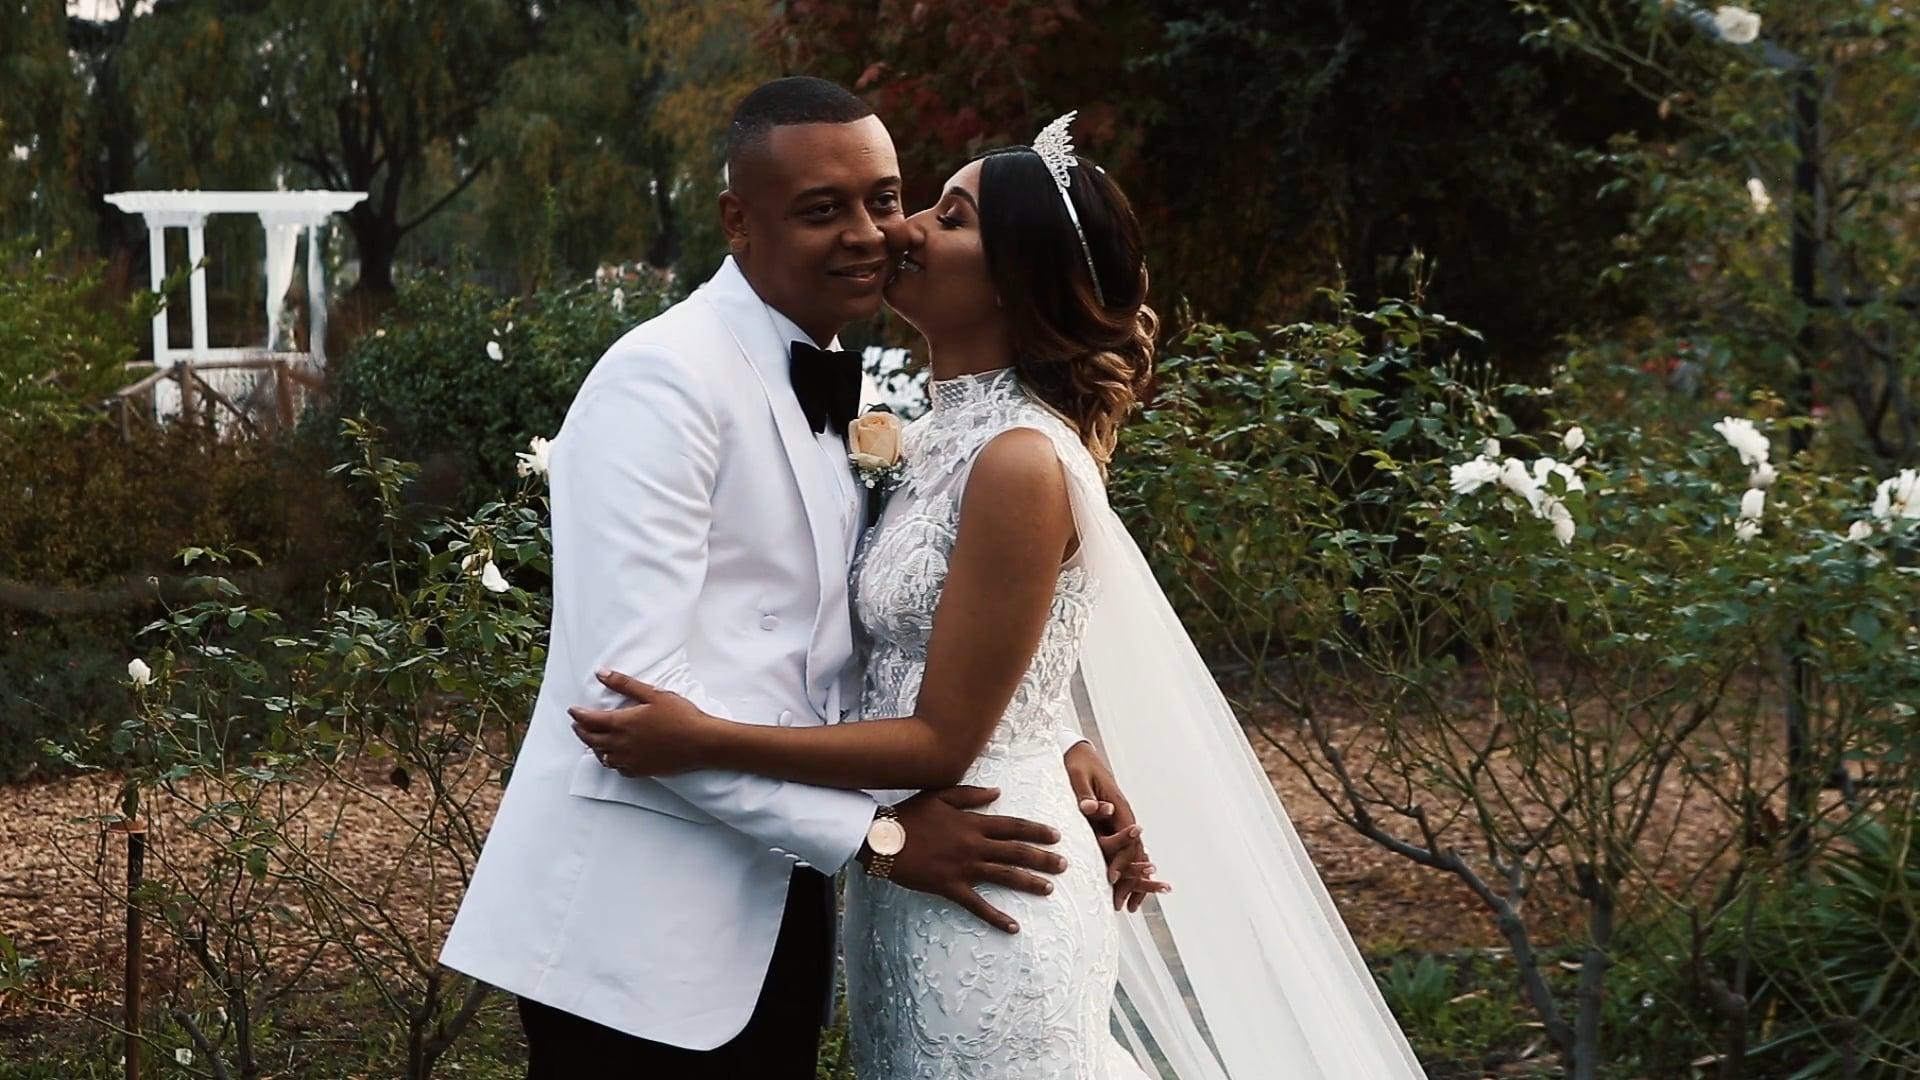 Bruno and Leila wedding preview, Hudsons Vredenheim, Stellenbosch - 25 May 2019